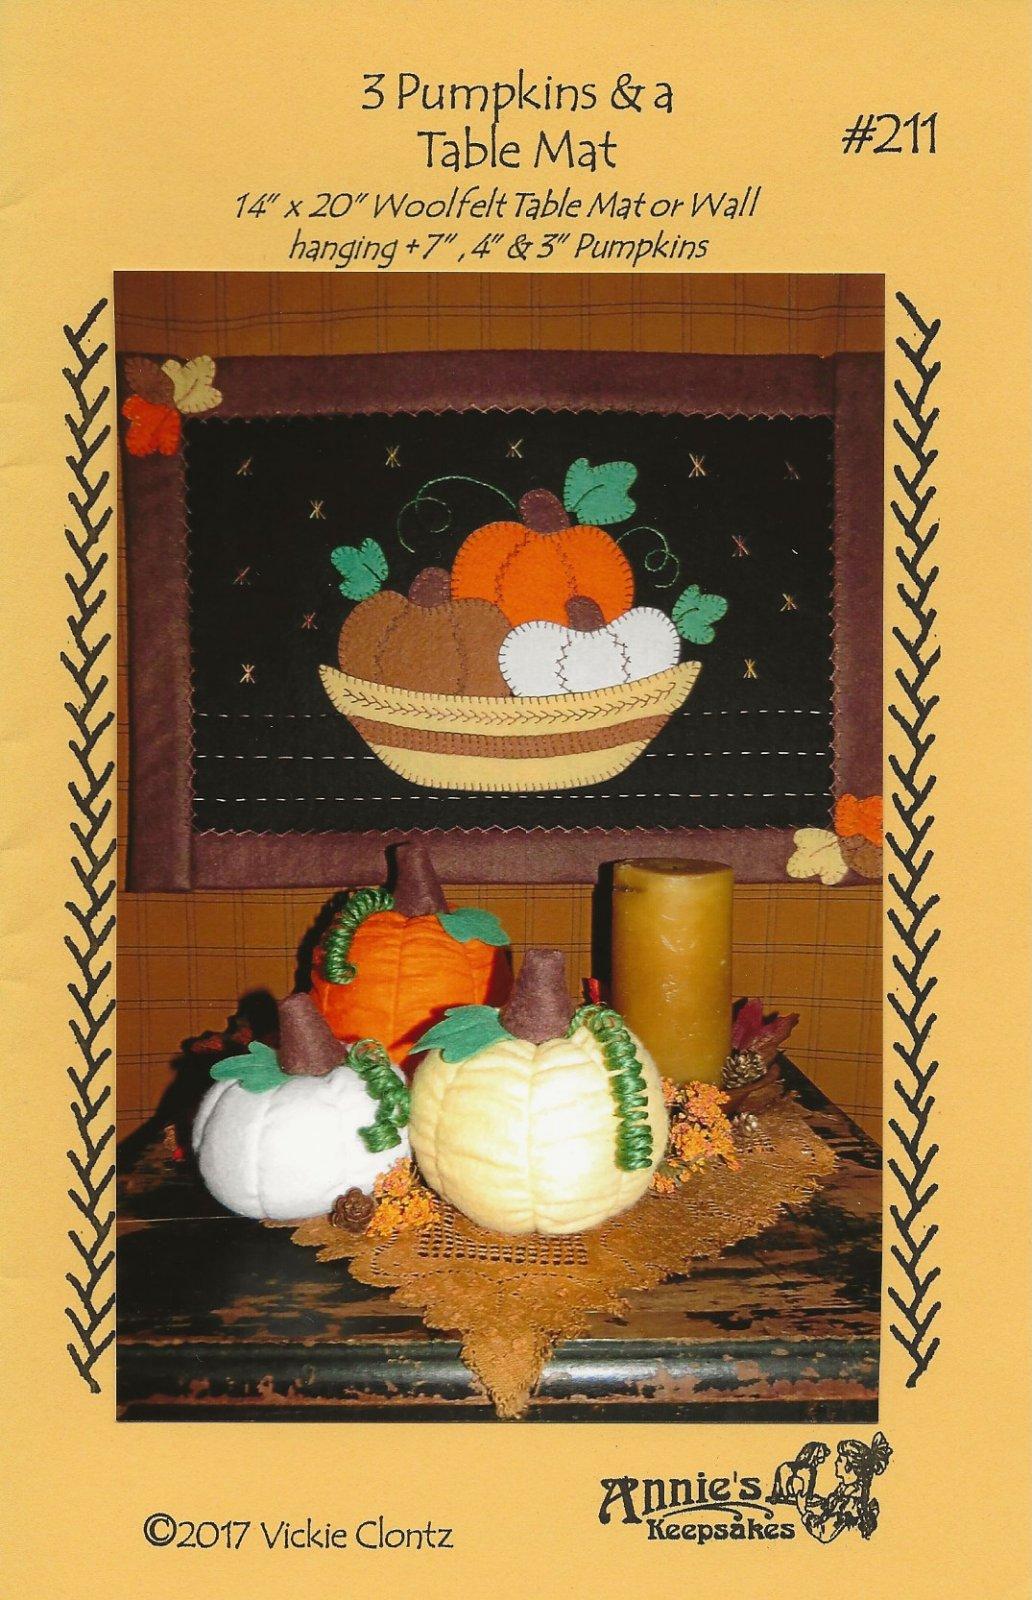 3 Pumpkins & a Table Mat